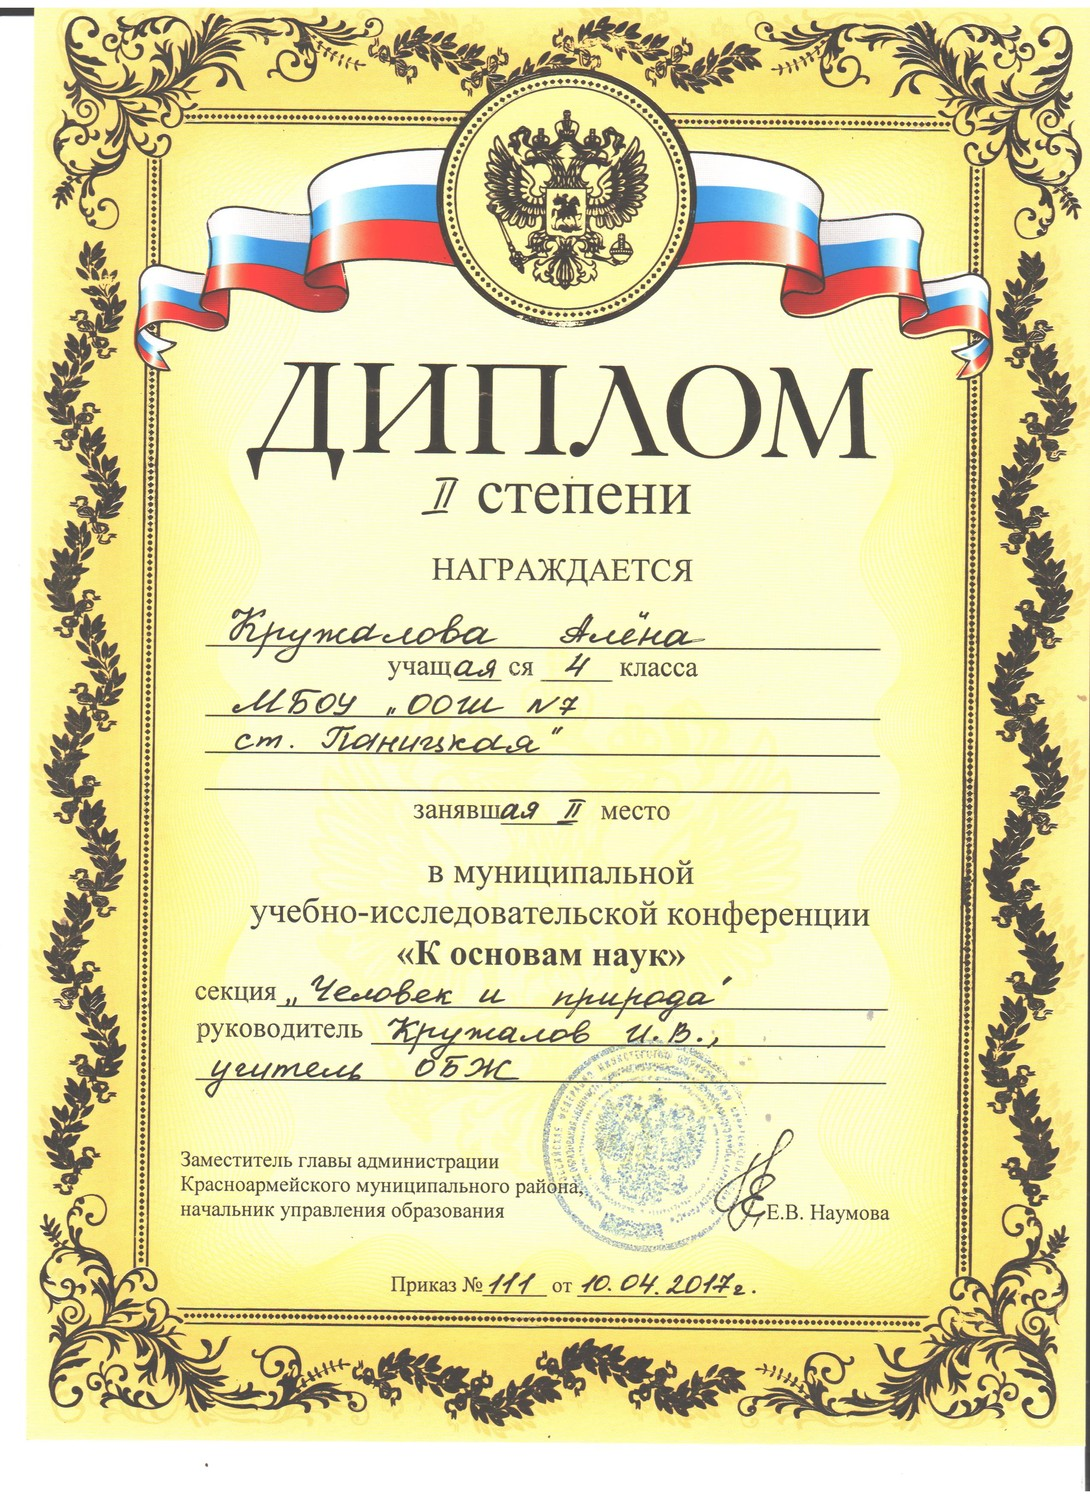 http://mbou7stpanitska.ucoz.ru/_nw/1/87061740.jpg